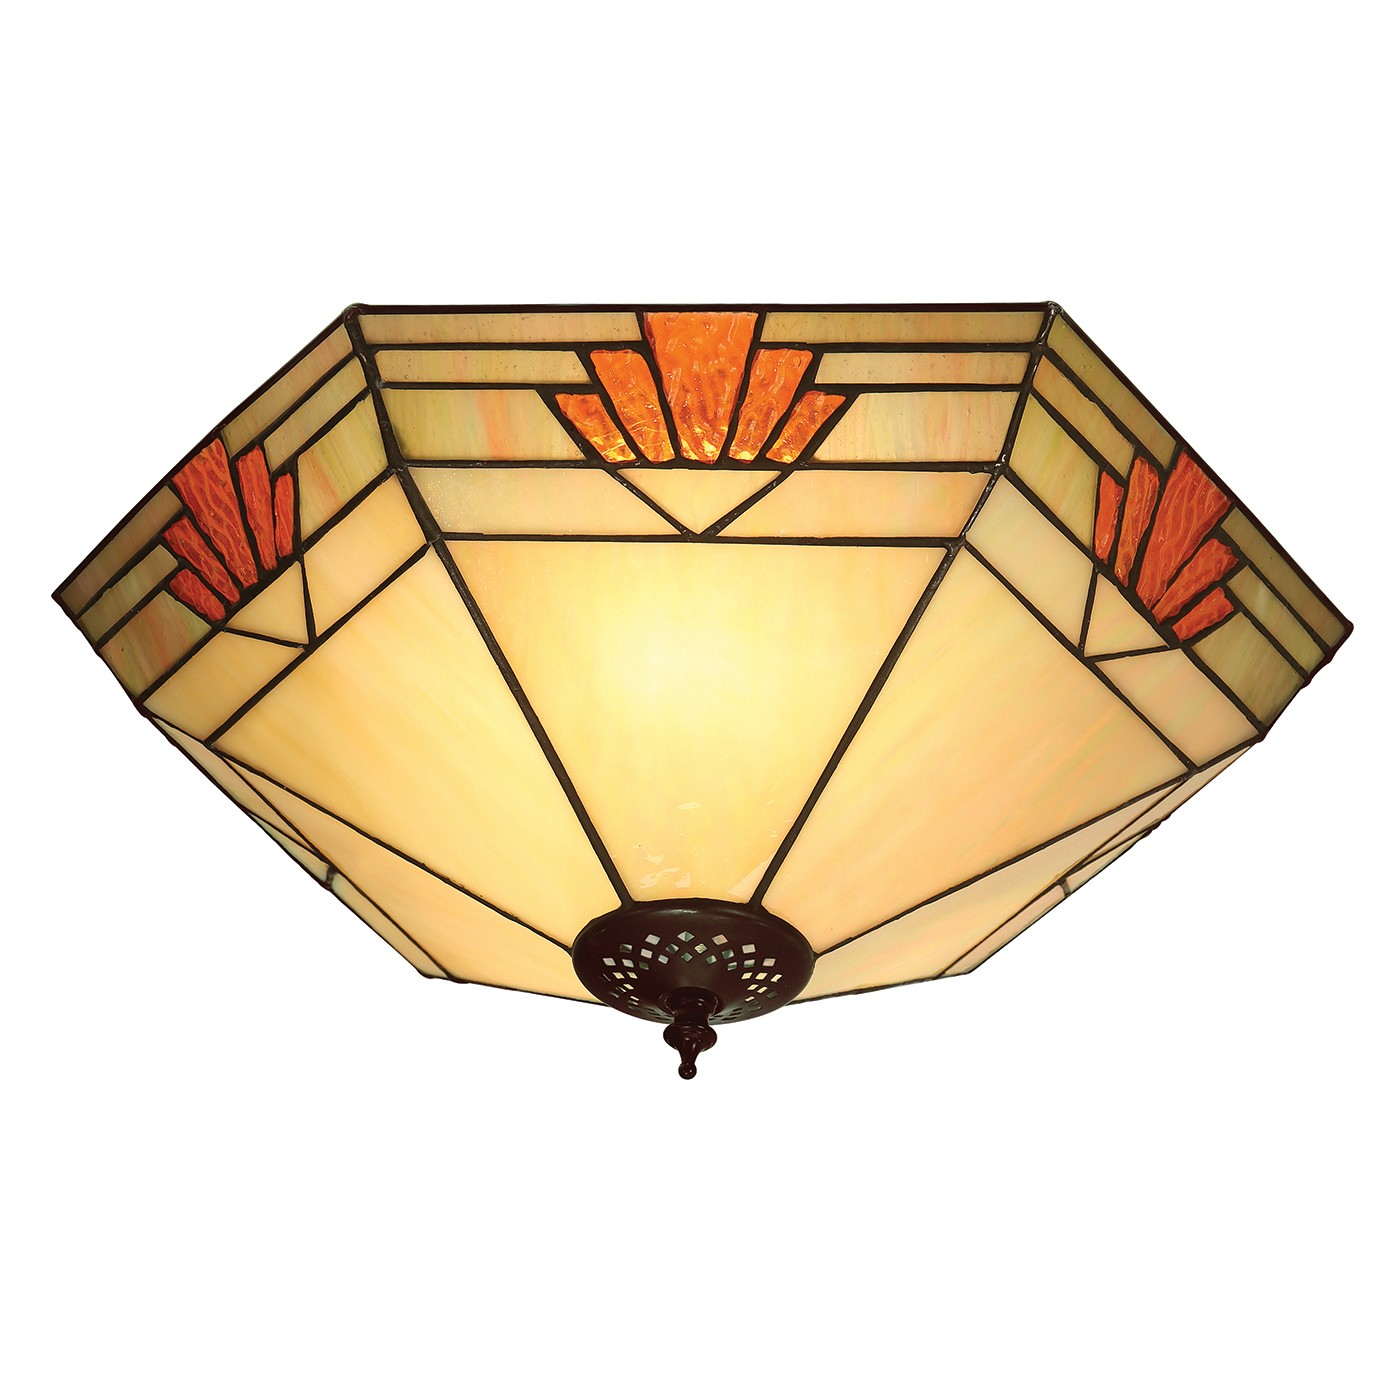 Nevada 64284 Tiffany Large 2 Light Flush Fitting Lighting Bug Swindon